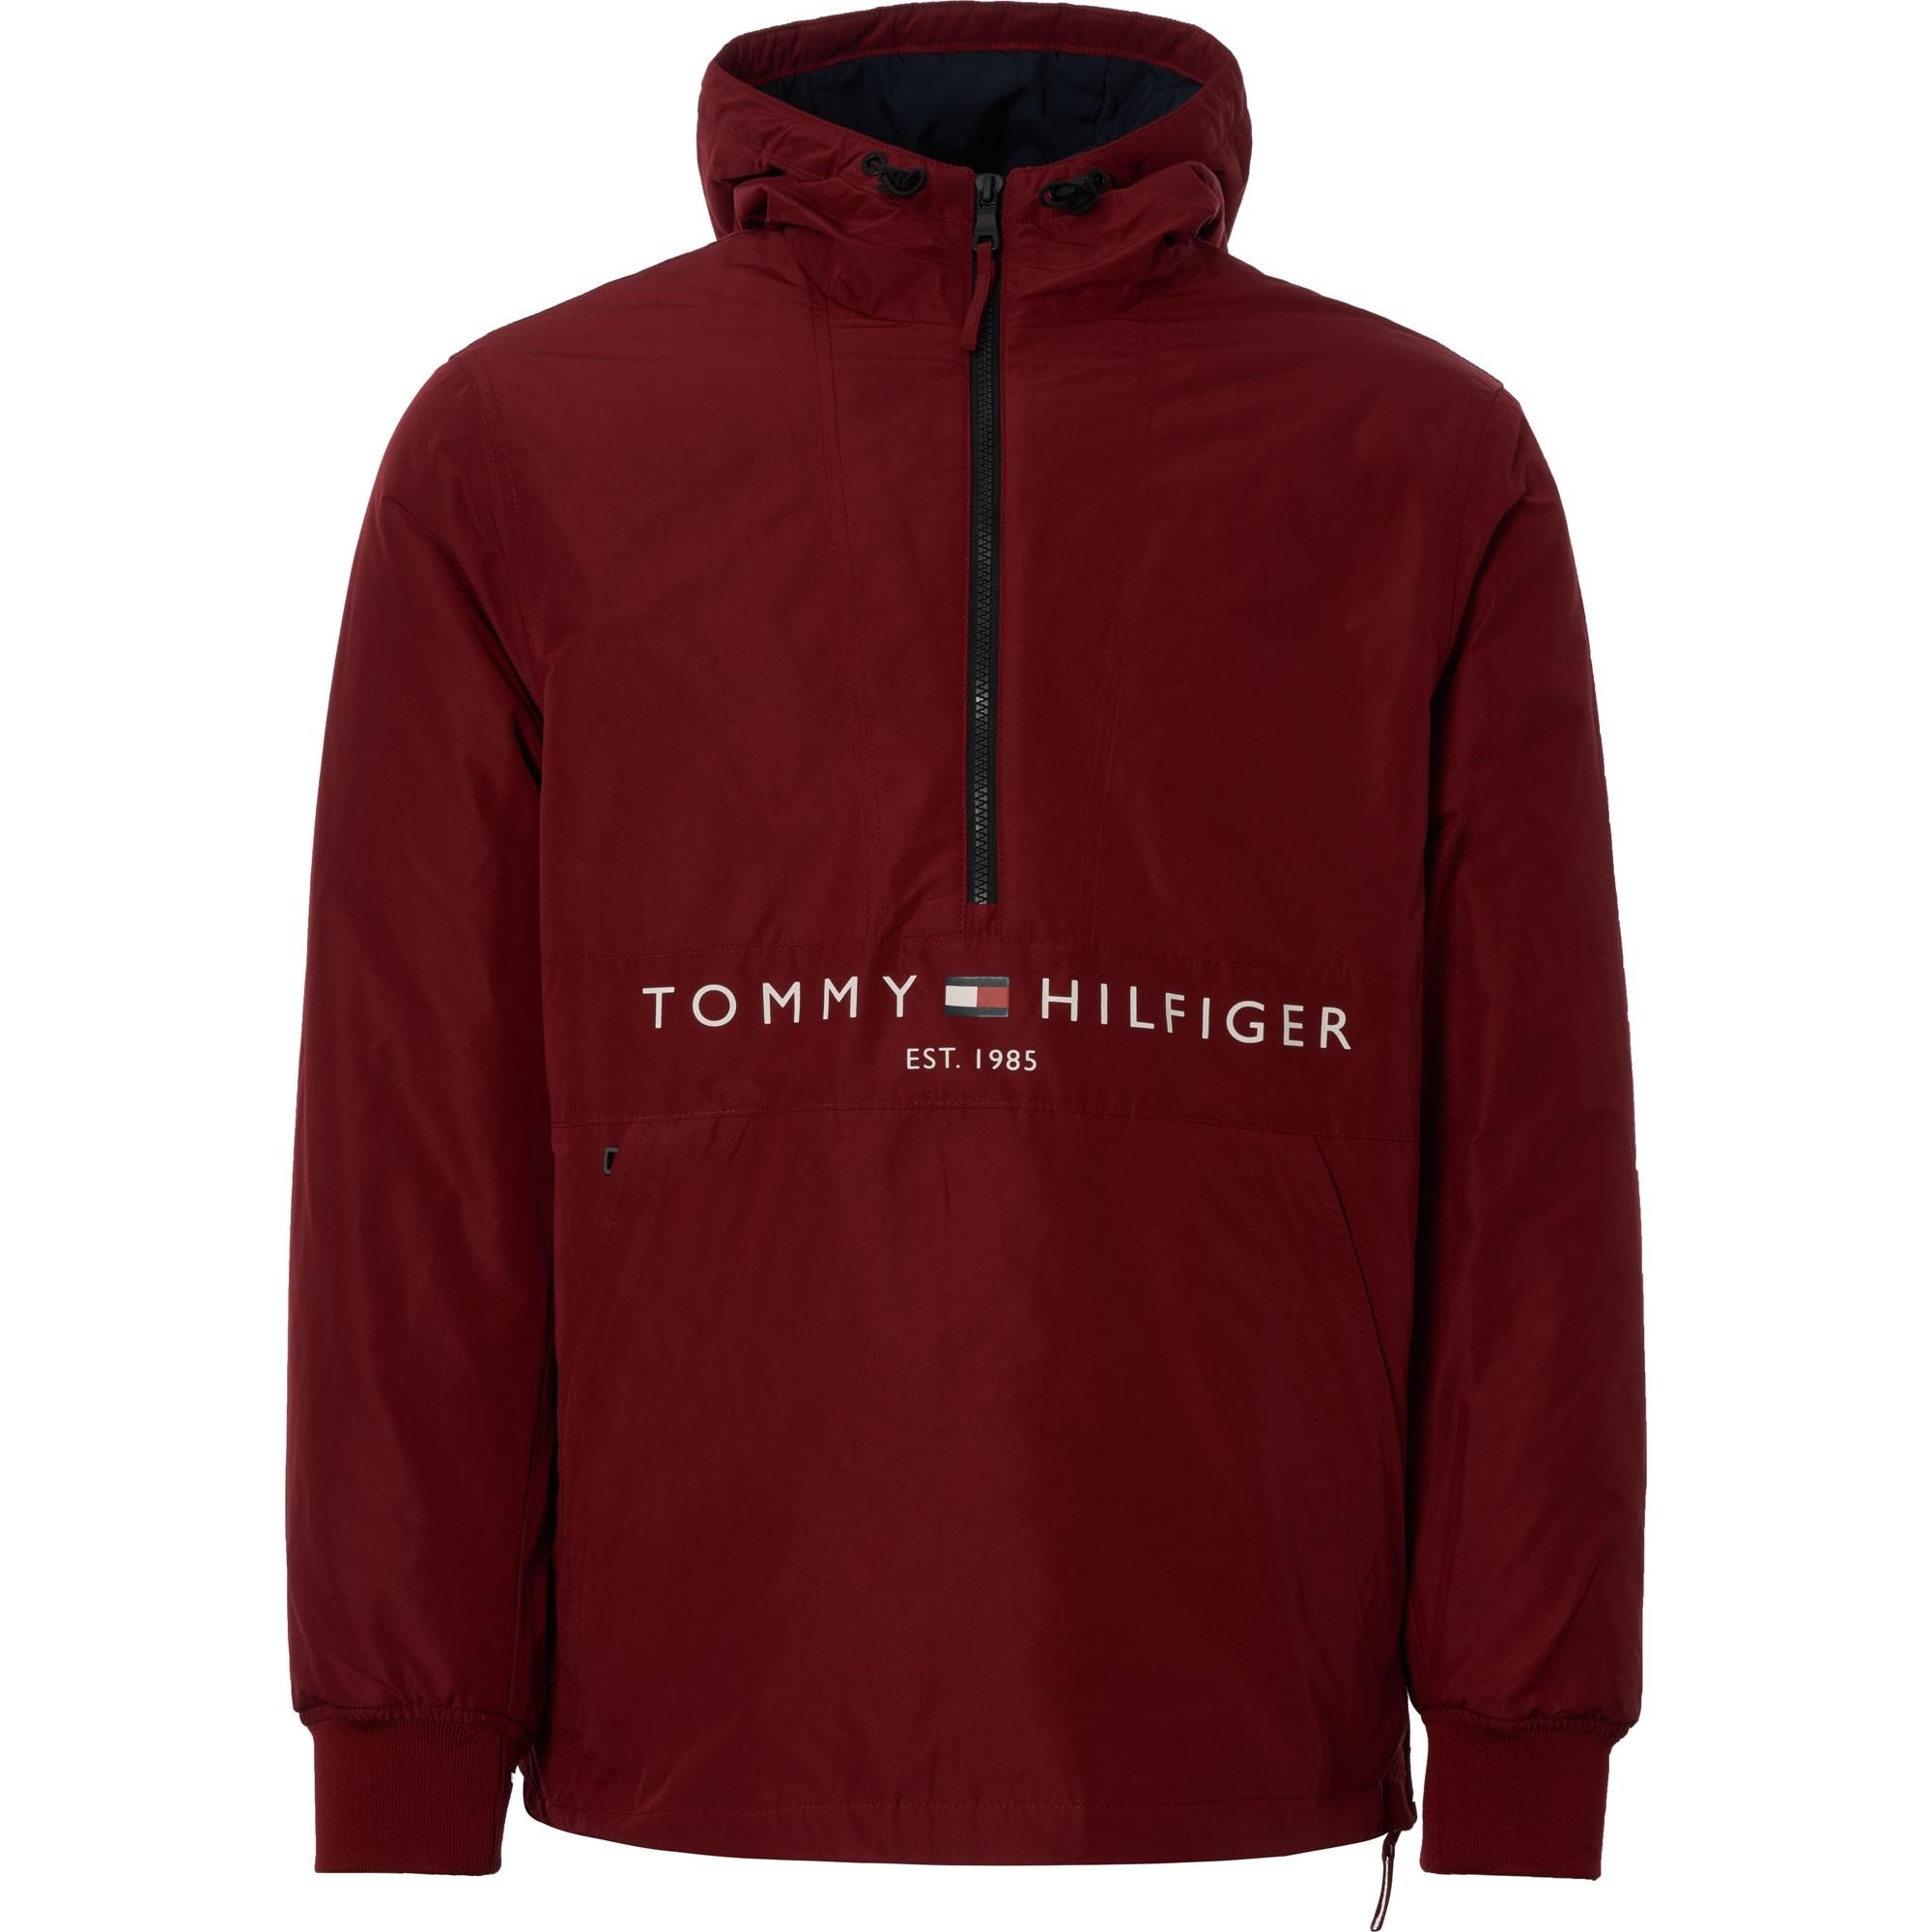 5f91855ce63d1 Tommy Hilfiger Padded Logo Anorak